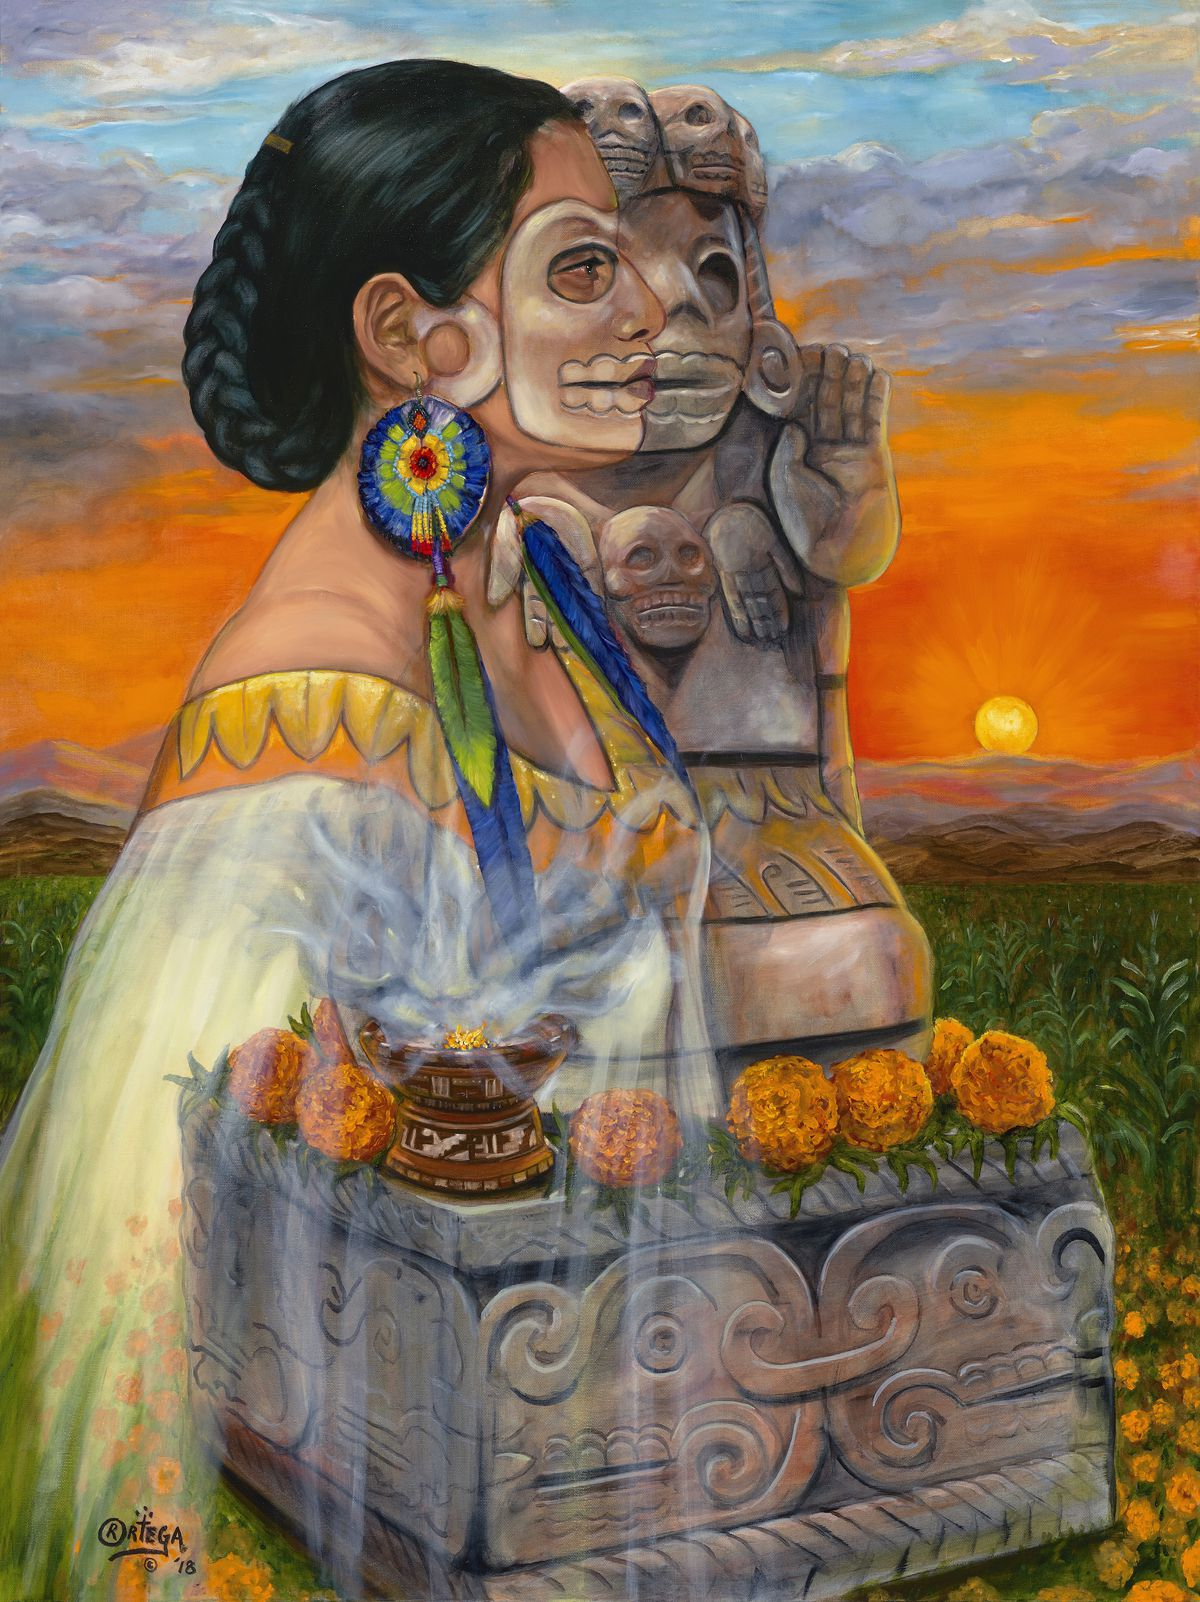 Rick Ortega,Espíritu de Cihuateteo, 2018, oil on canvas, courtesy of the artist